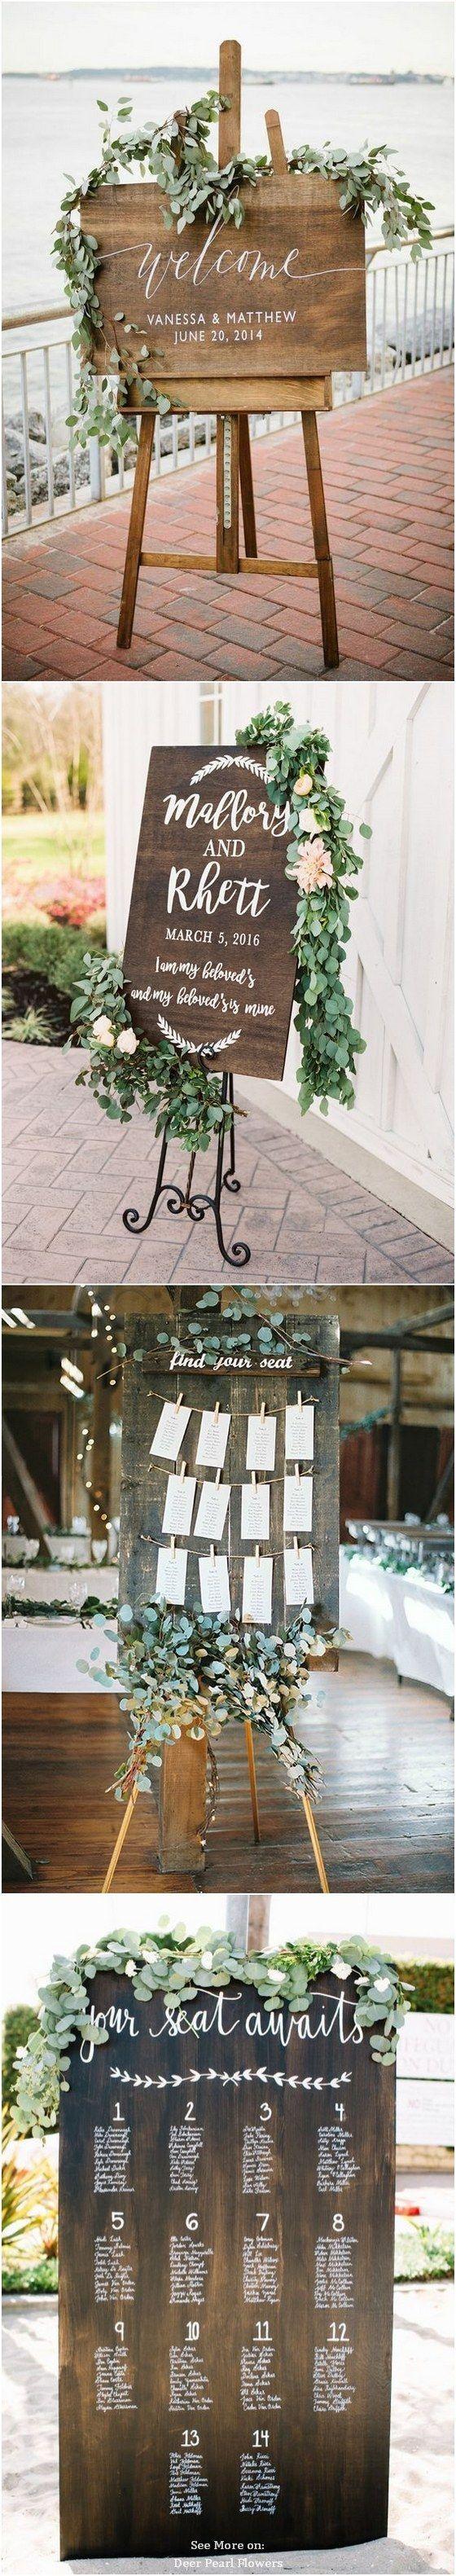 greenery eucalyptus wedding decor ideas green weddings